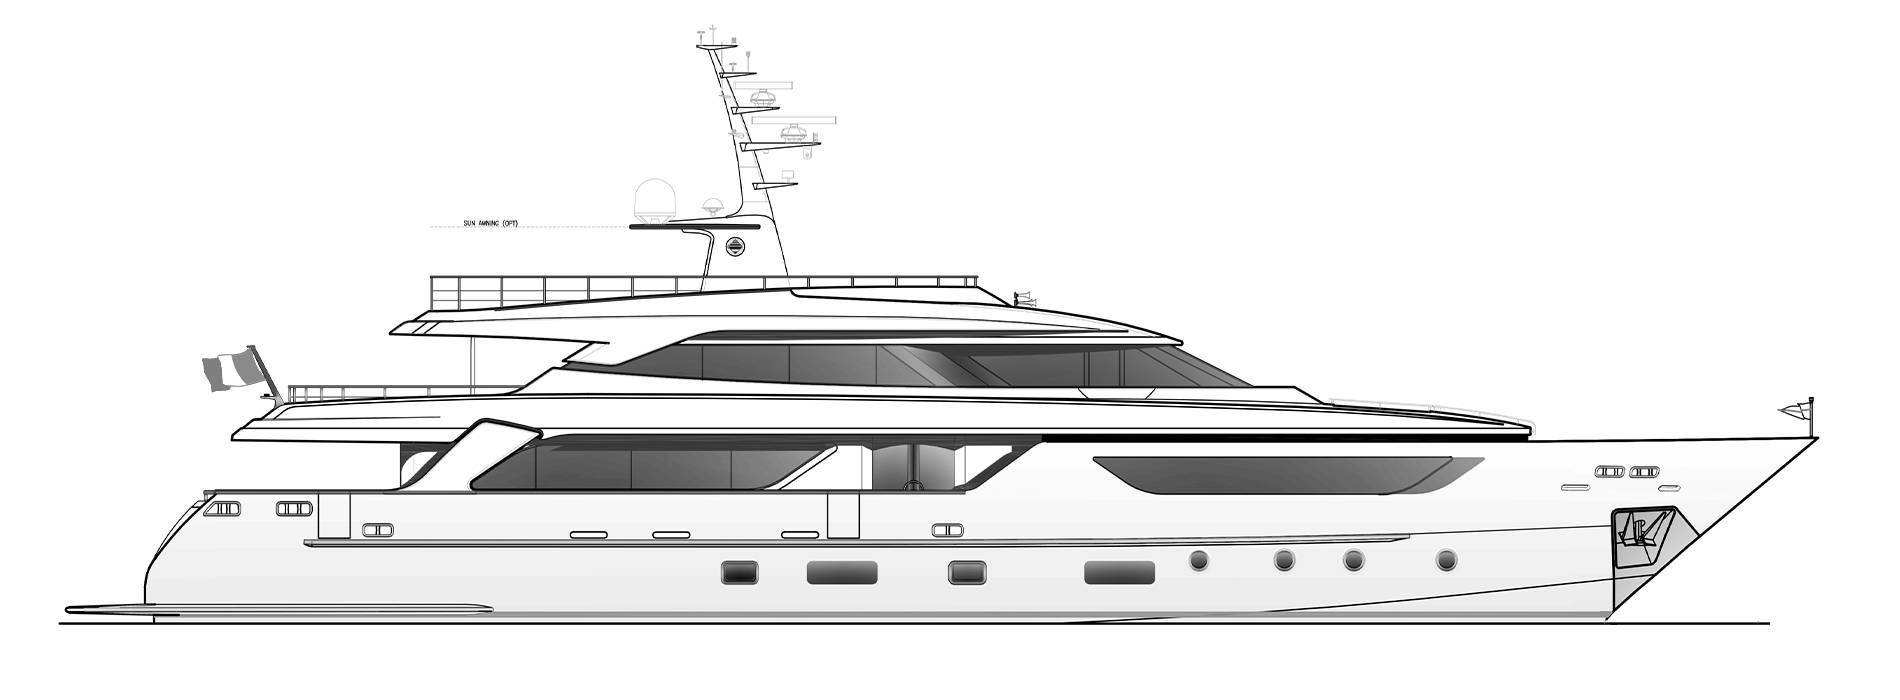 Sanlorenzo Yachts SD122-127 Perfil